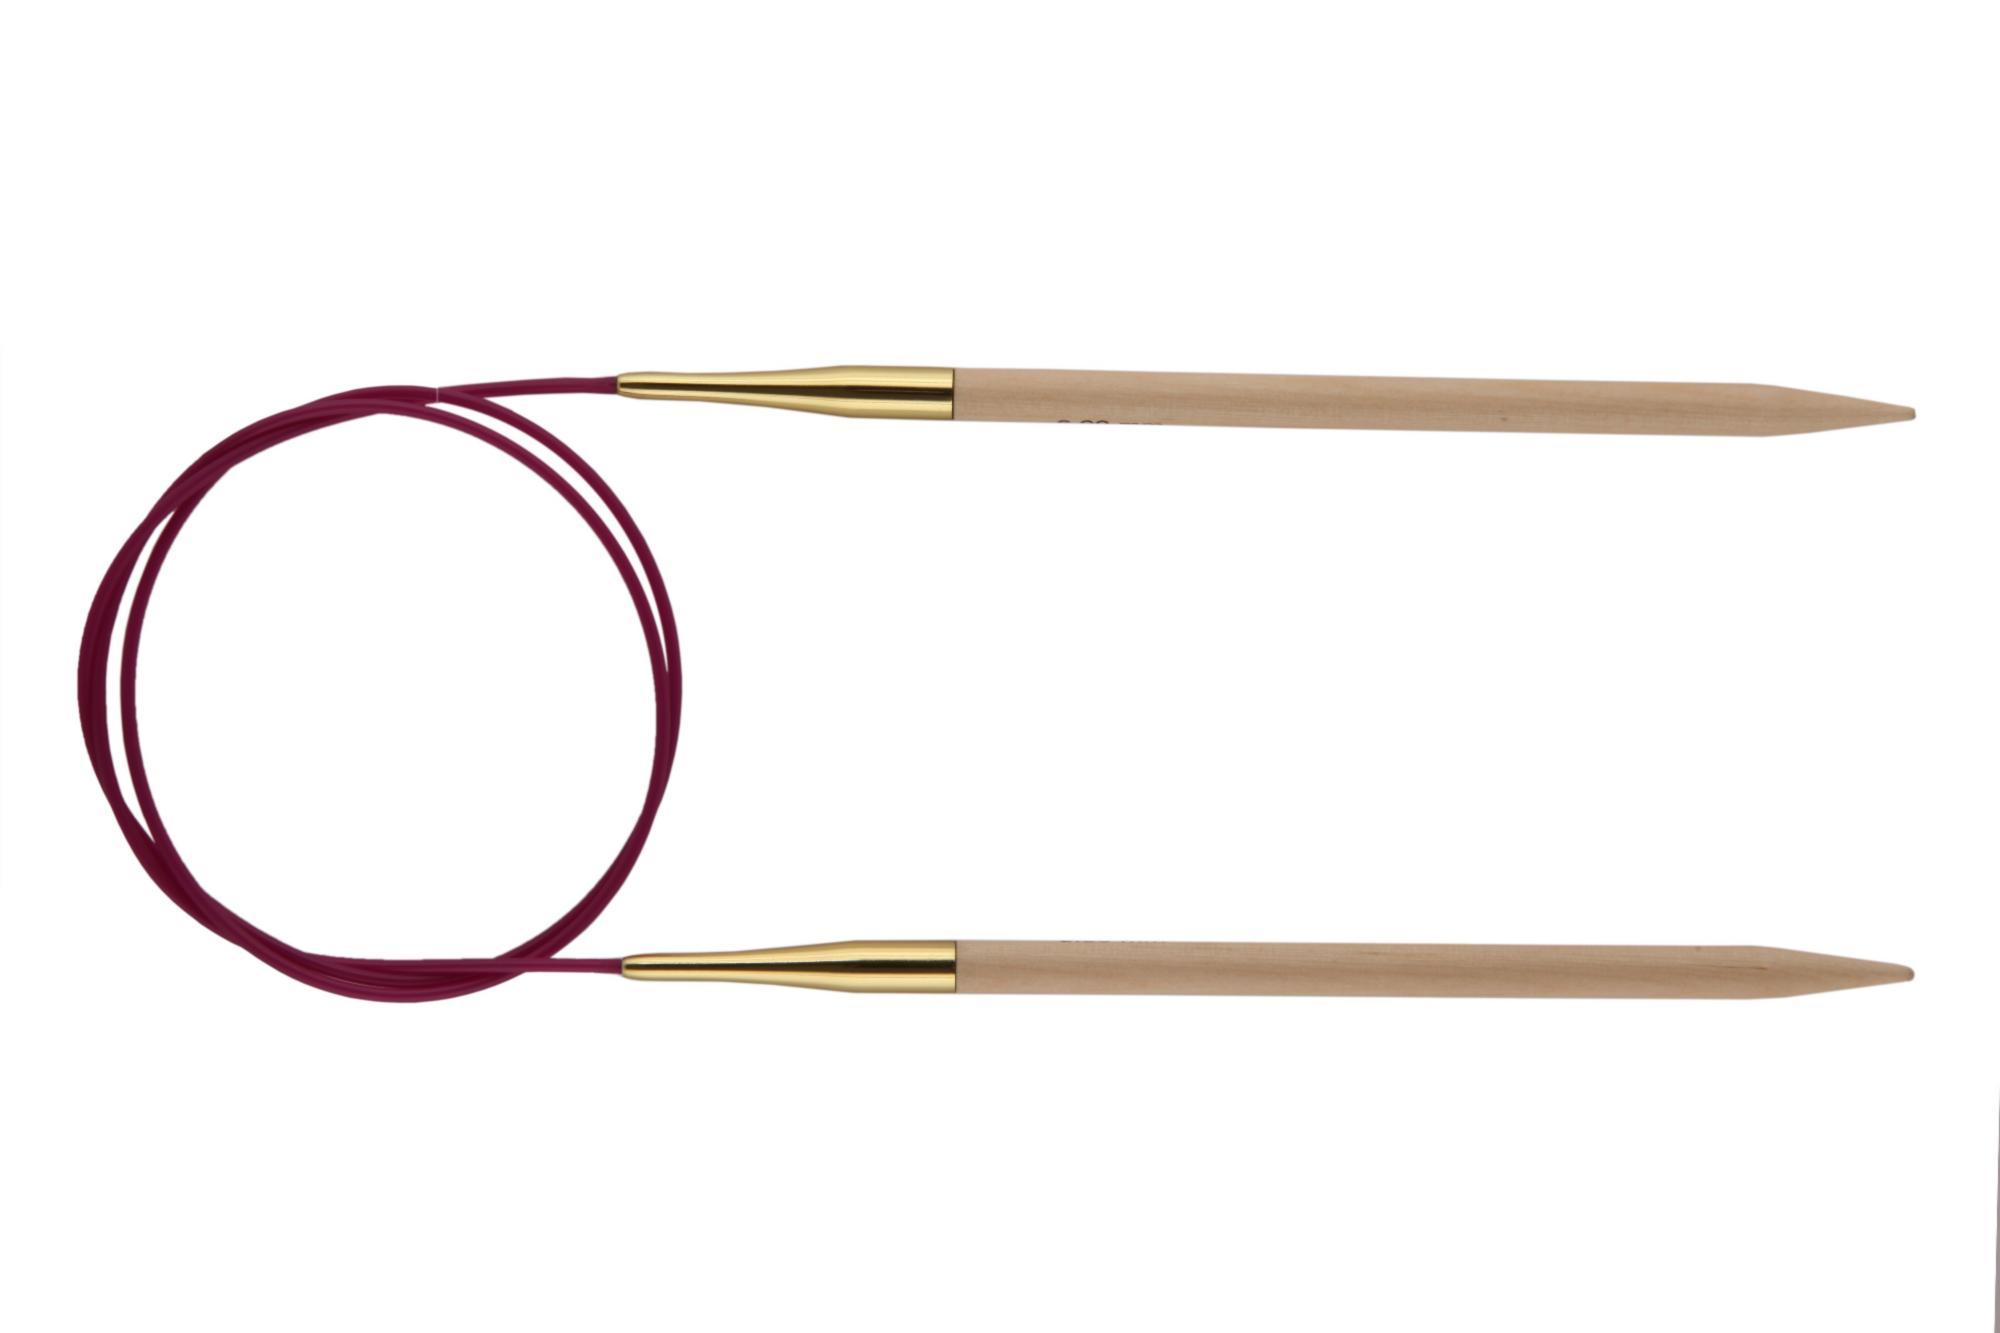 Спицы круговые 100 см Basix Birch Wood KnitPro, 35343, 6.50 мм